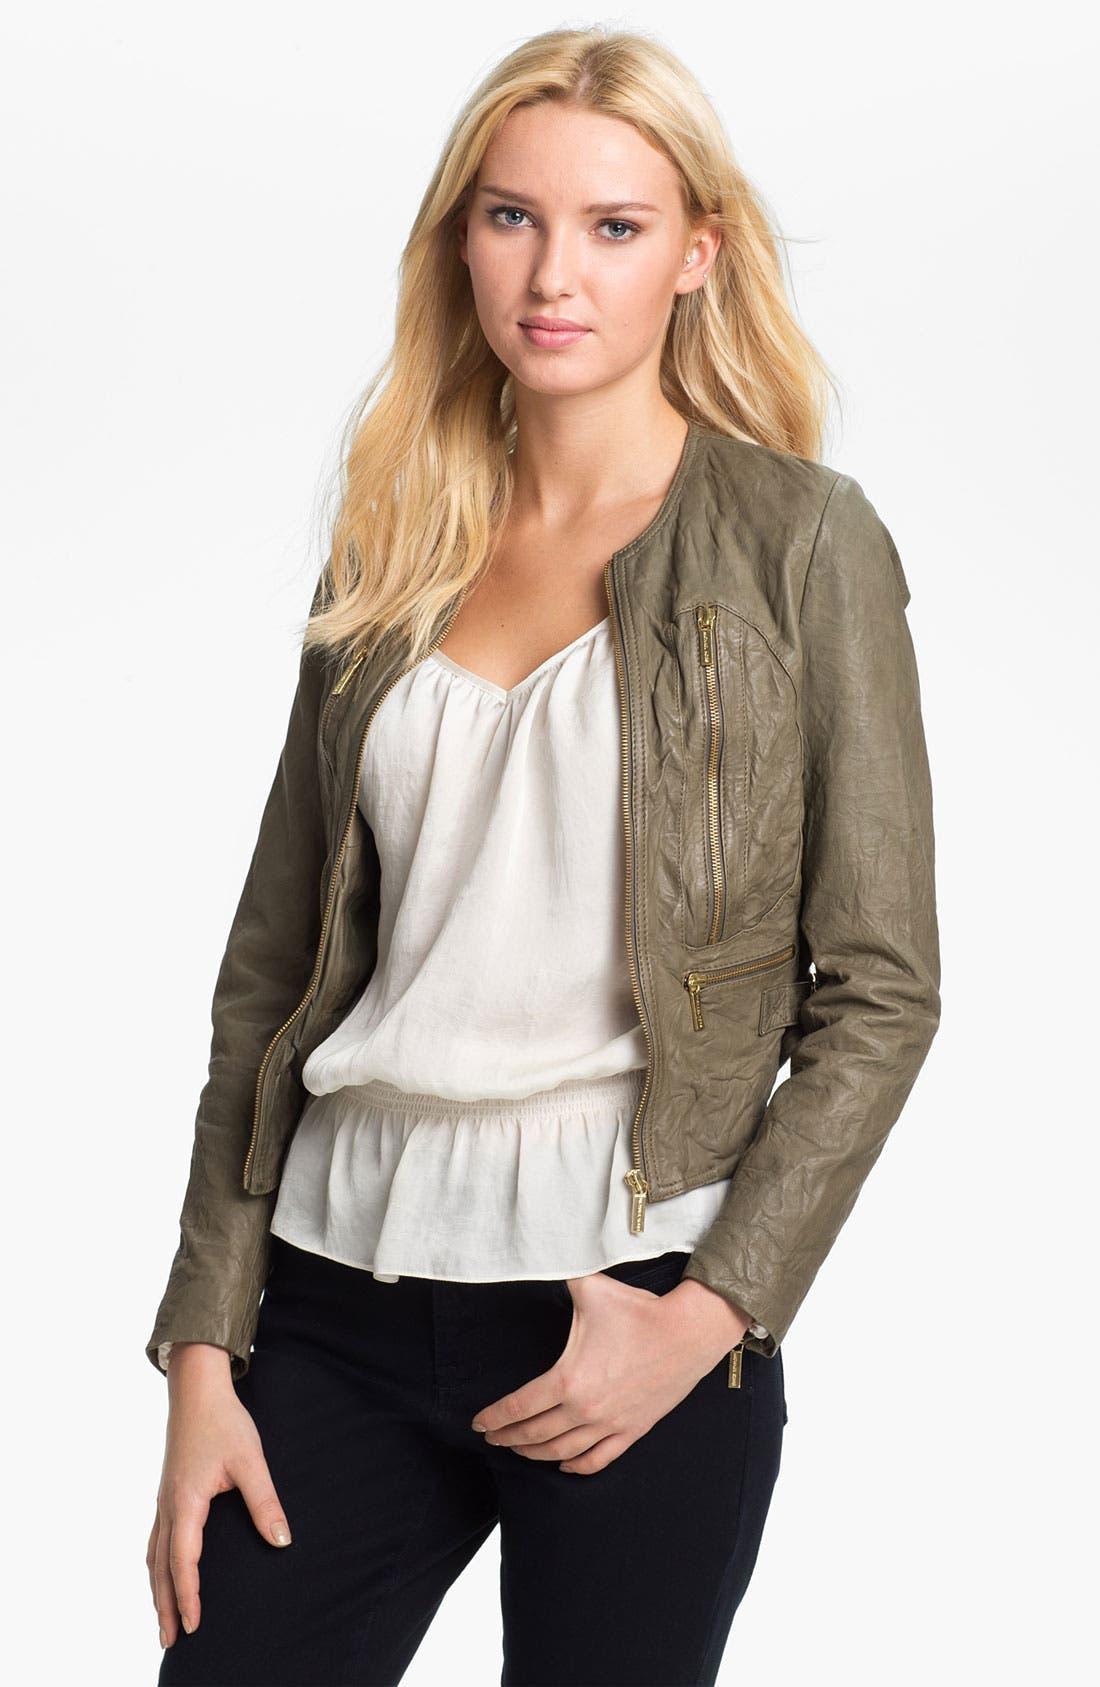 Alternate Image 1 Selected - MICHAEL Michael Kors Soft Leather Jacket (Petite)